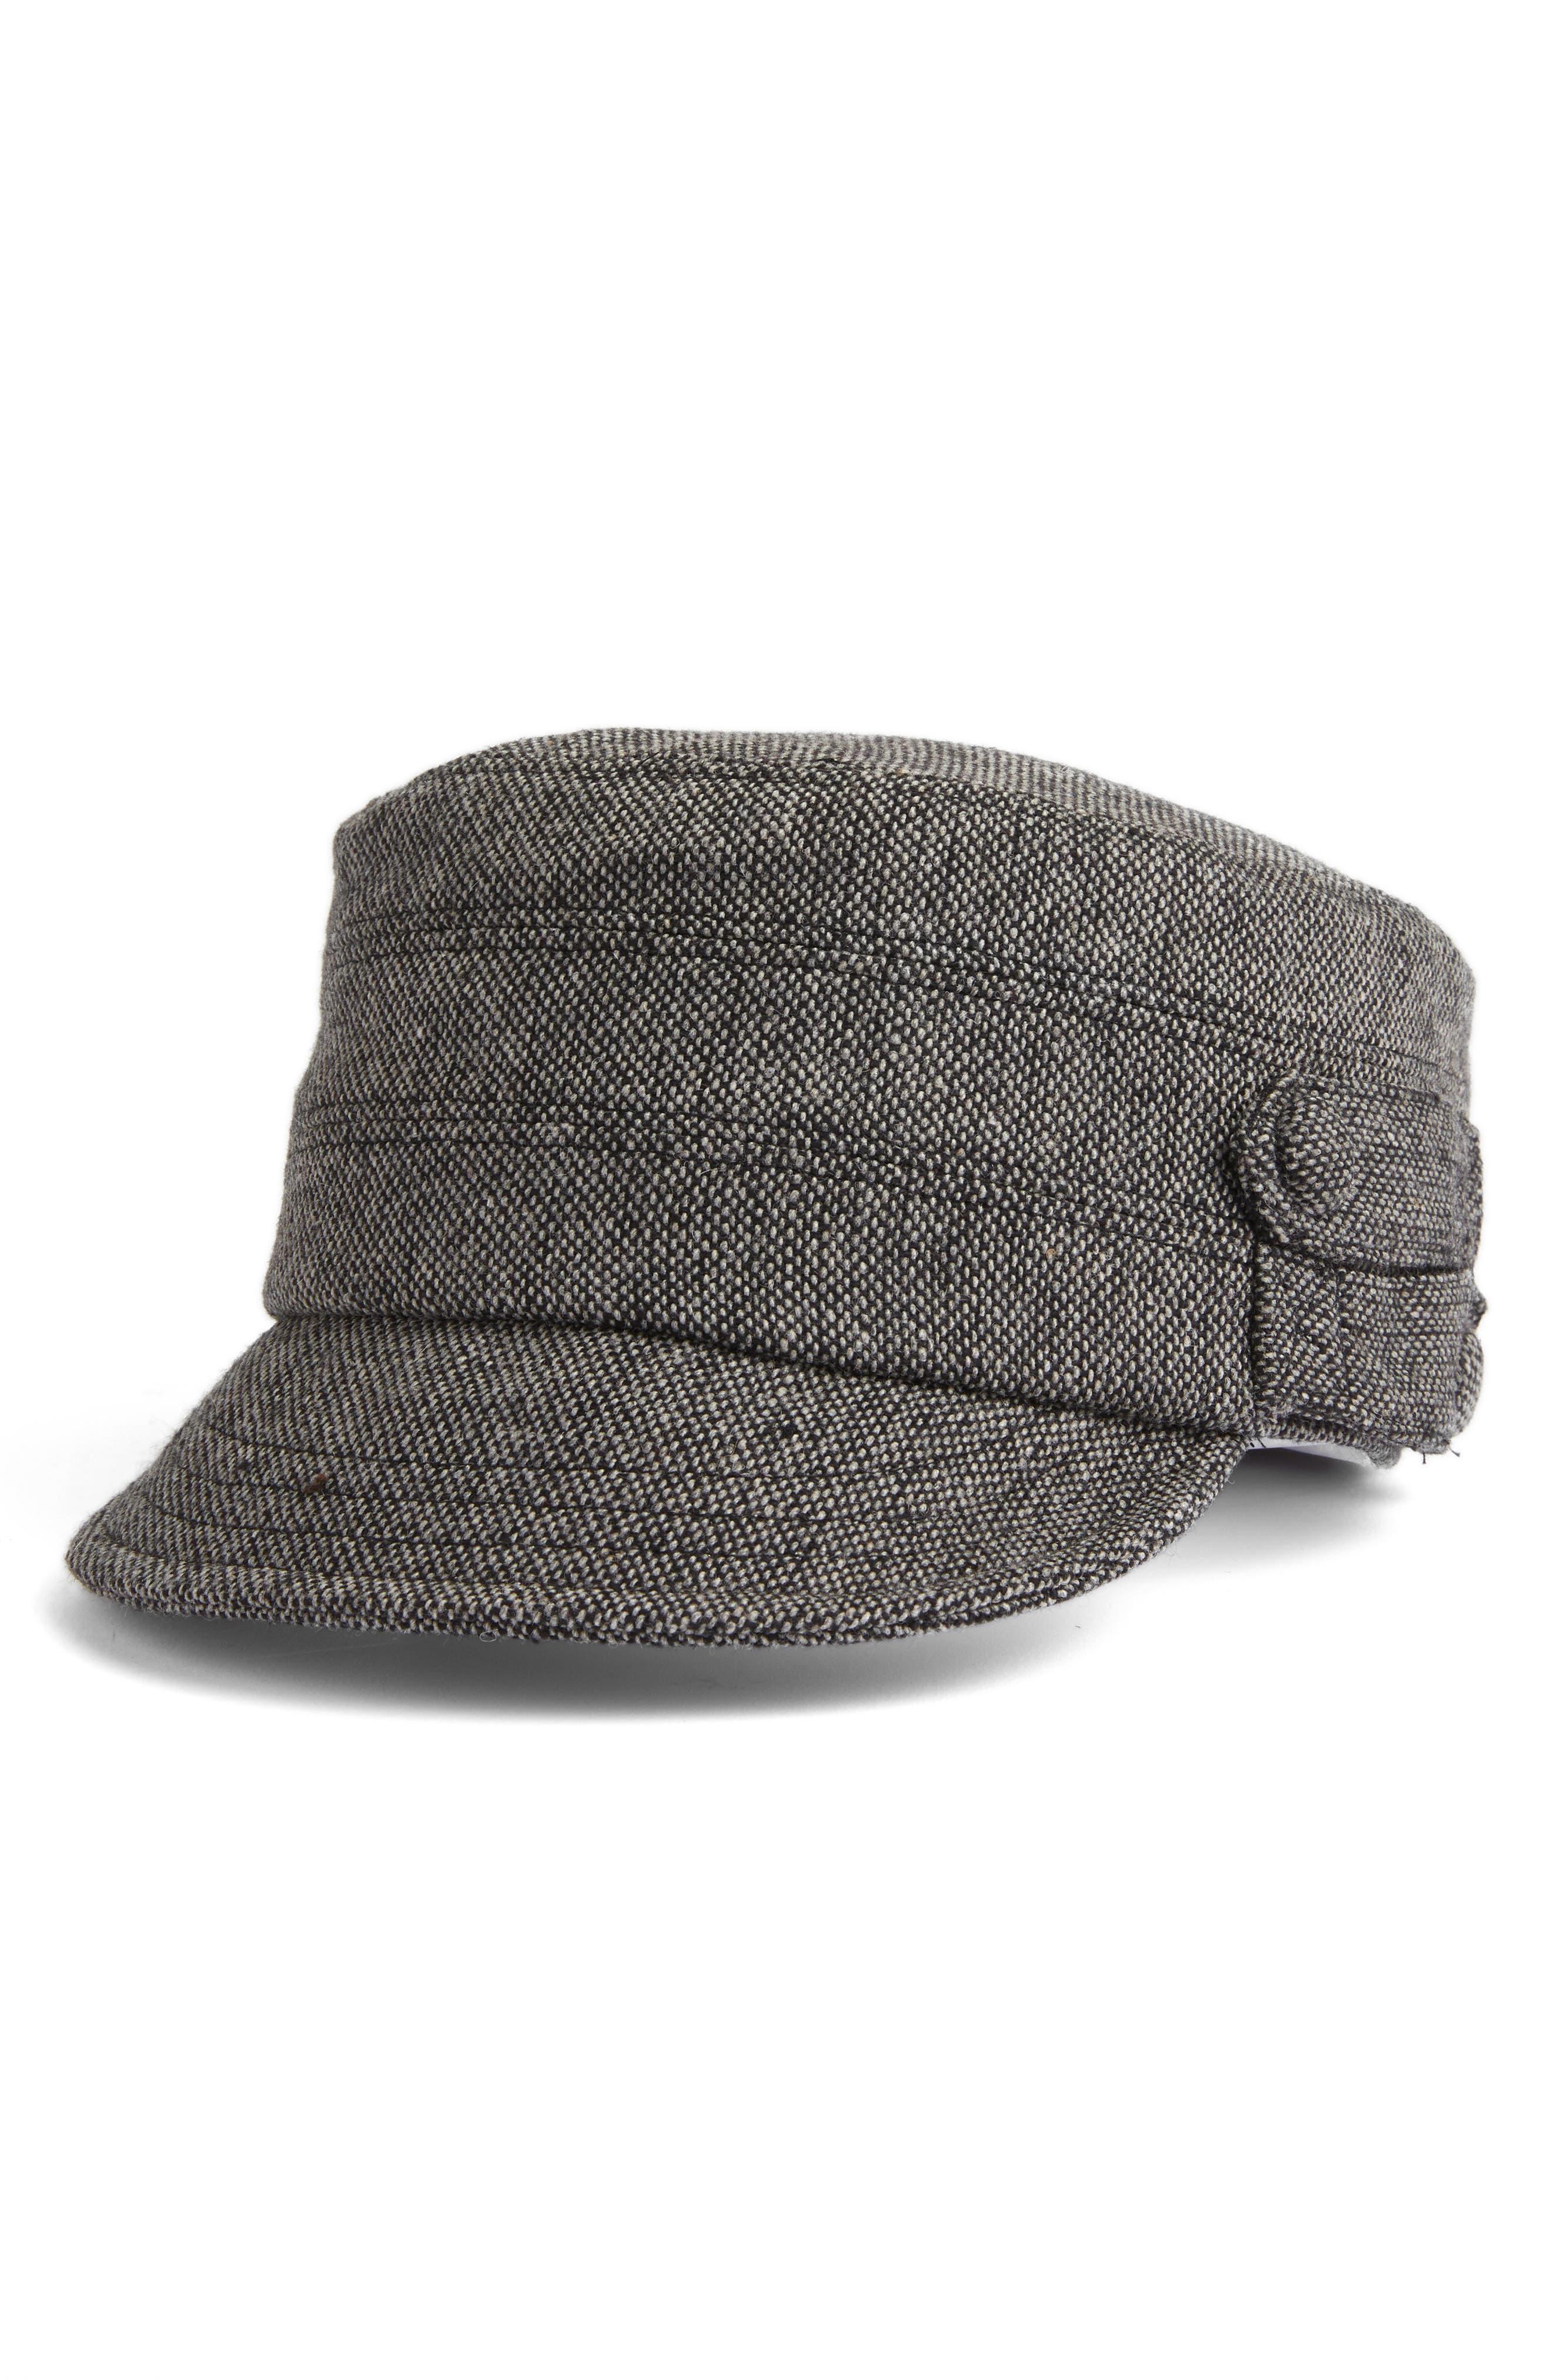 807928132567. Women s San Diego Hat Tweed Cap - Black 480d7b8b5c9e